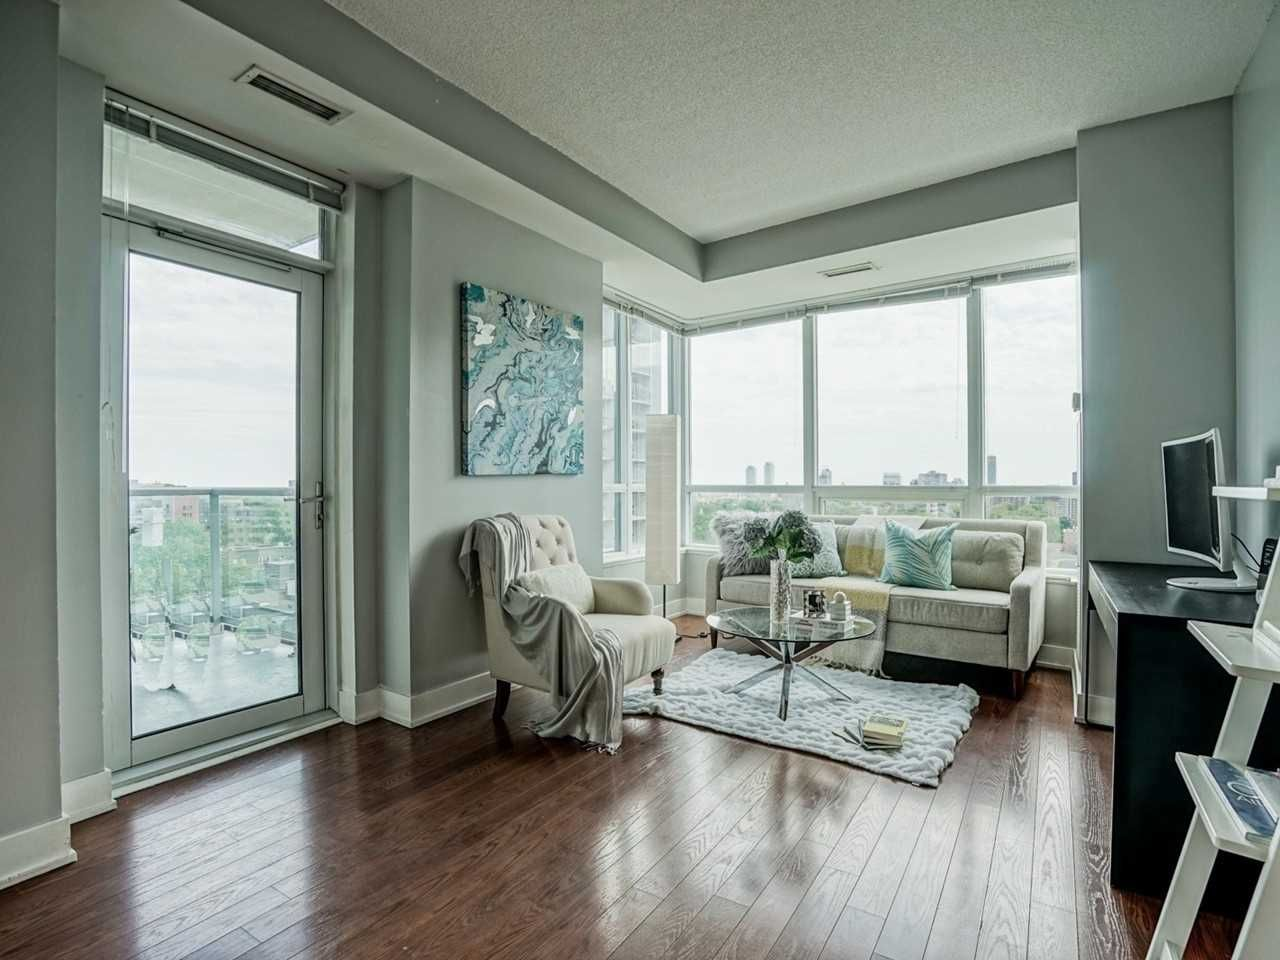 907 120 Homewood Ave, MLS C4550098. Toronto Condo Apt